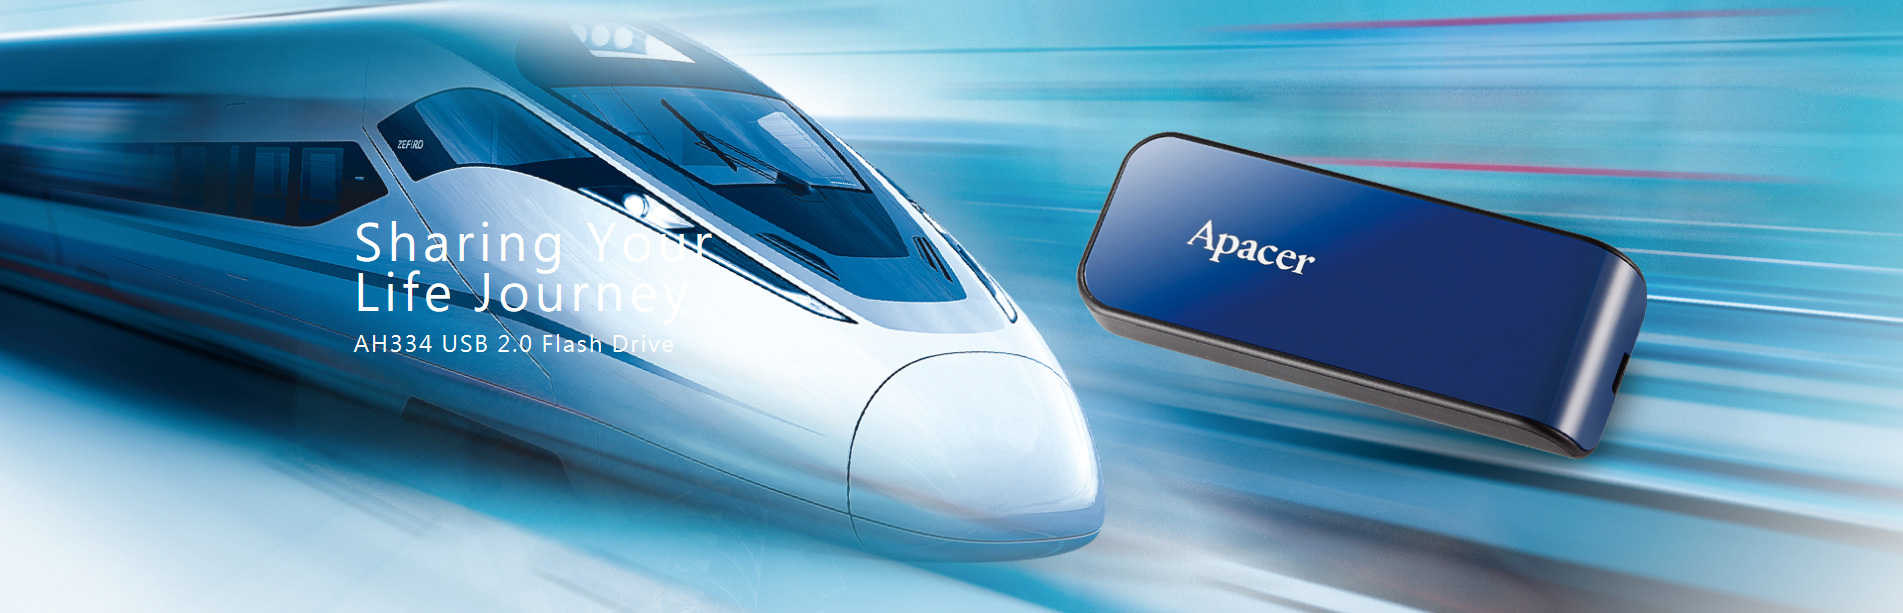 Apacer USB Drive 2.0 AH334